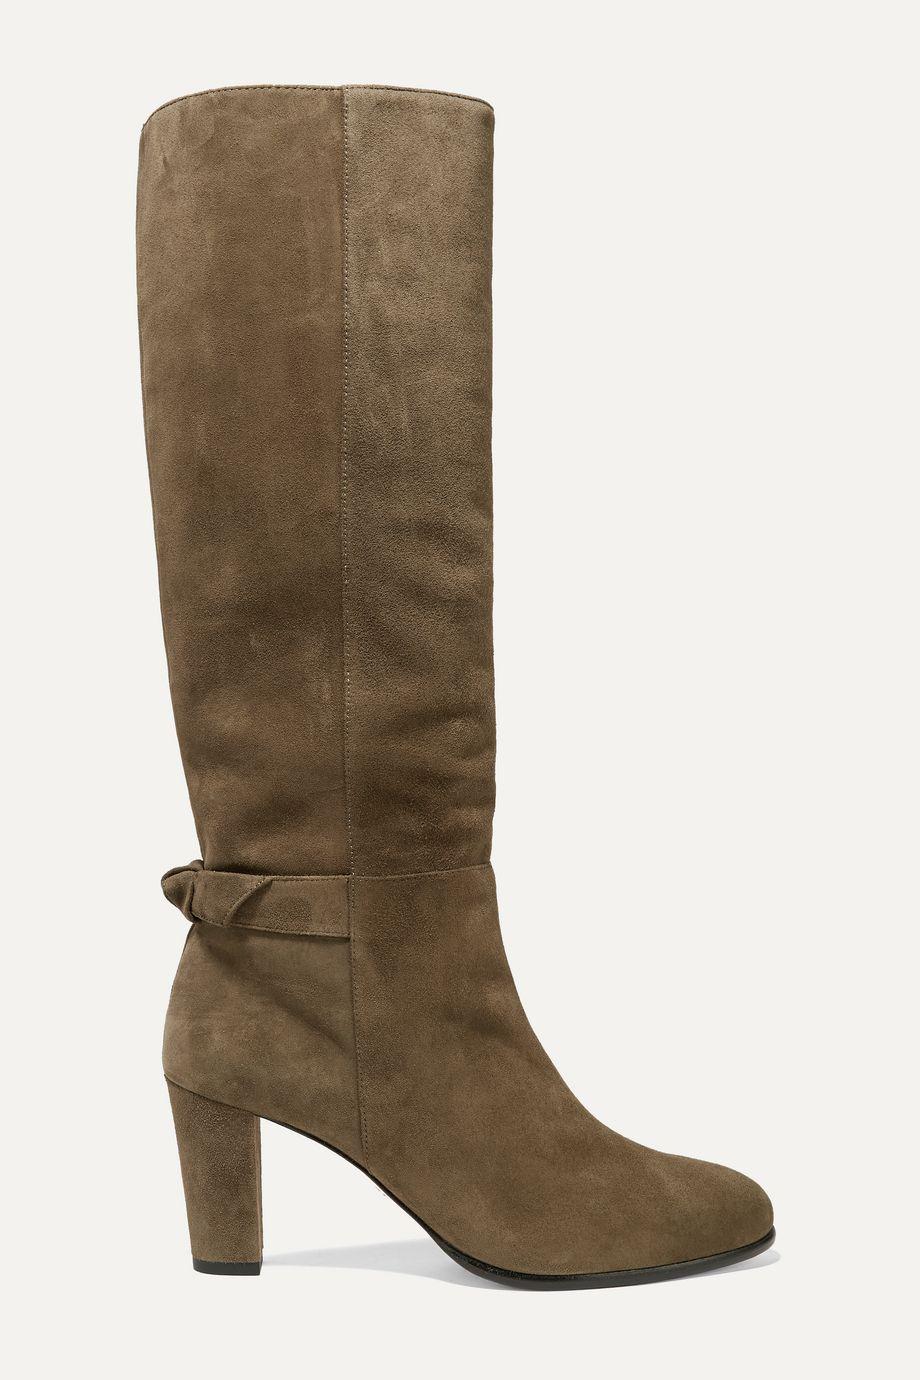 Alexandre Birman Rachel bow-embellished suede knee boots